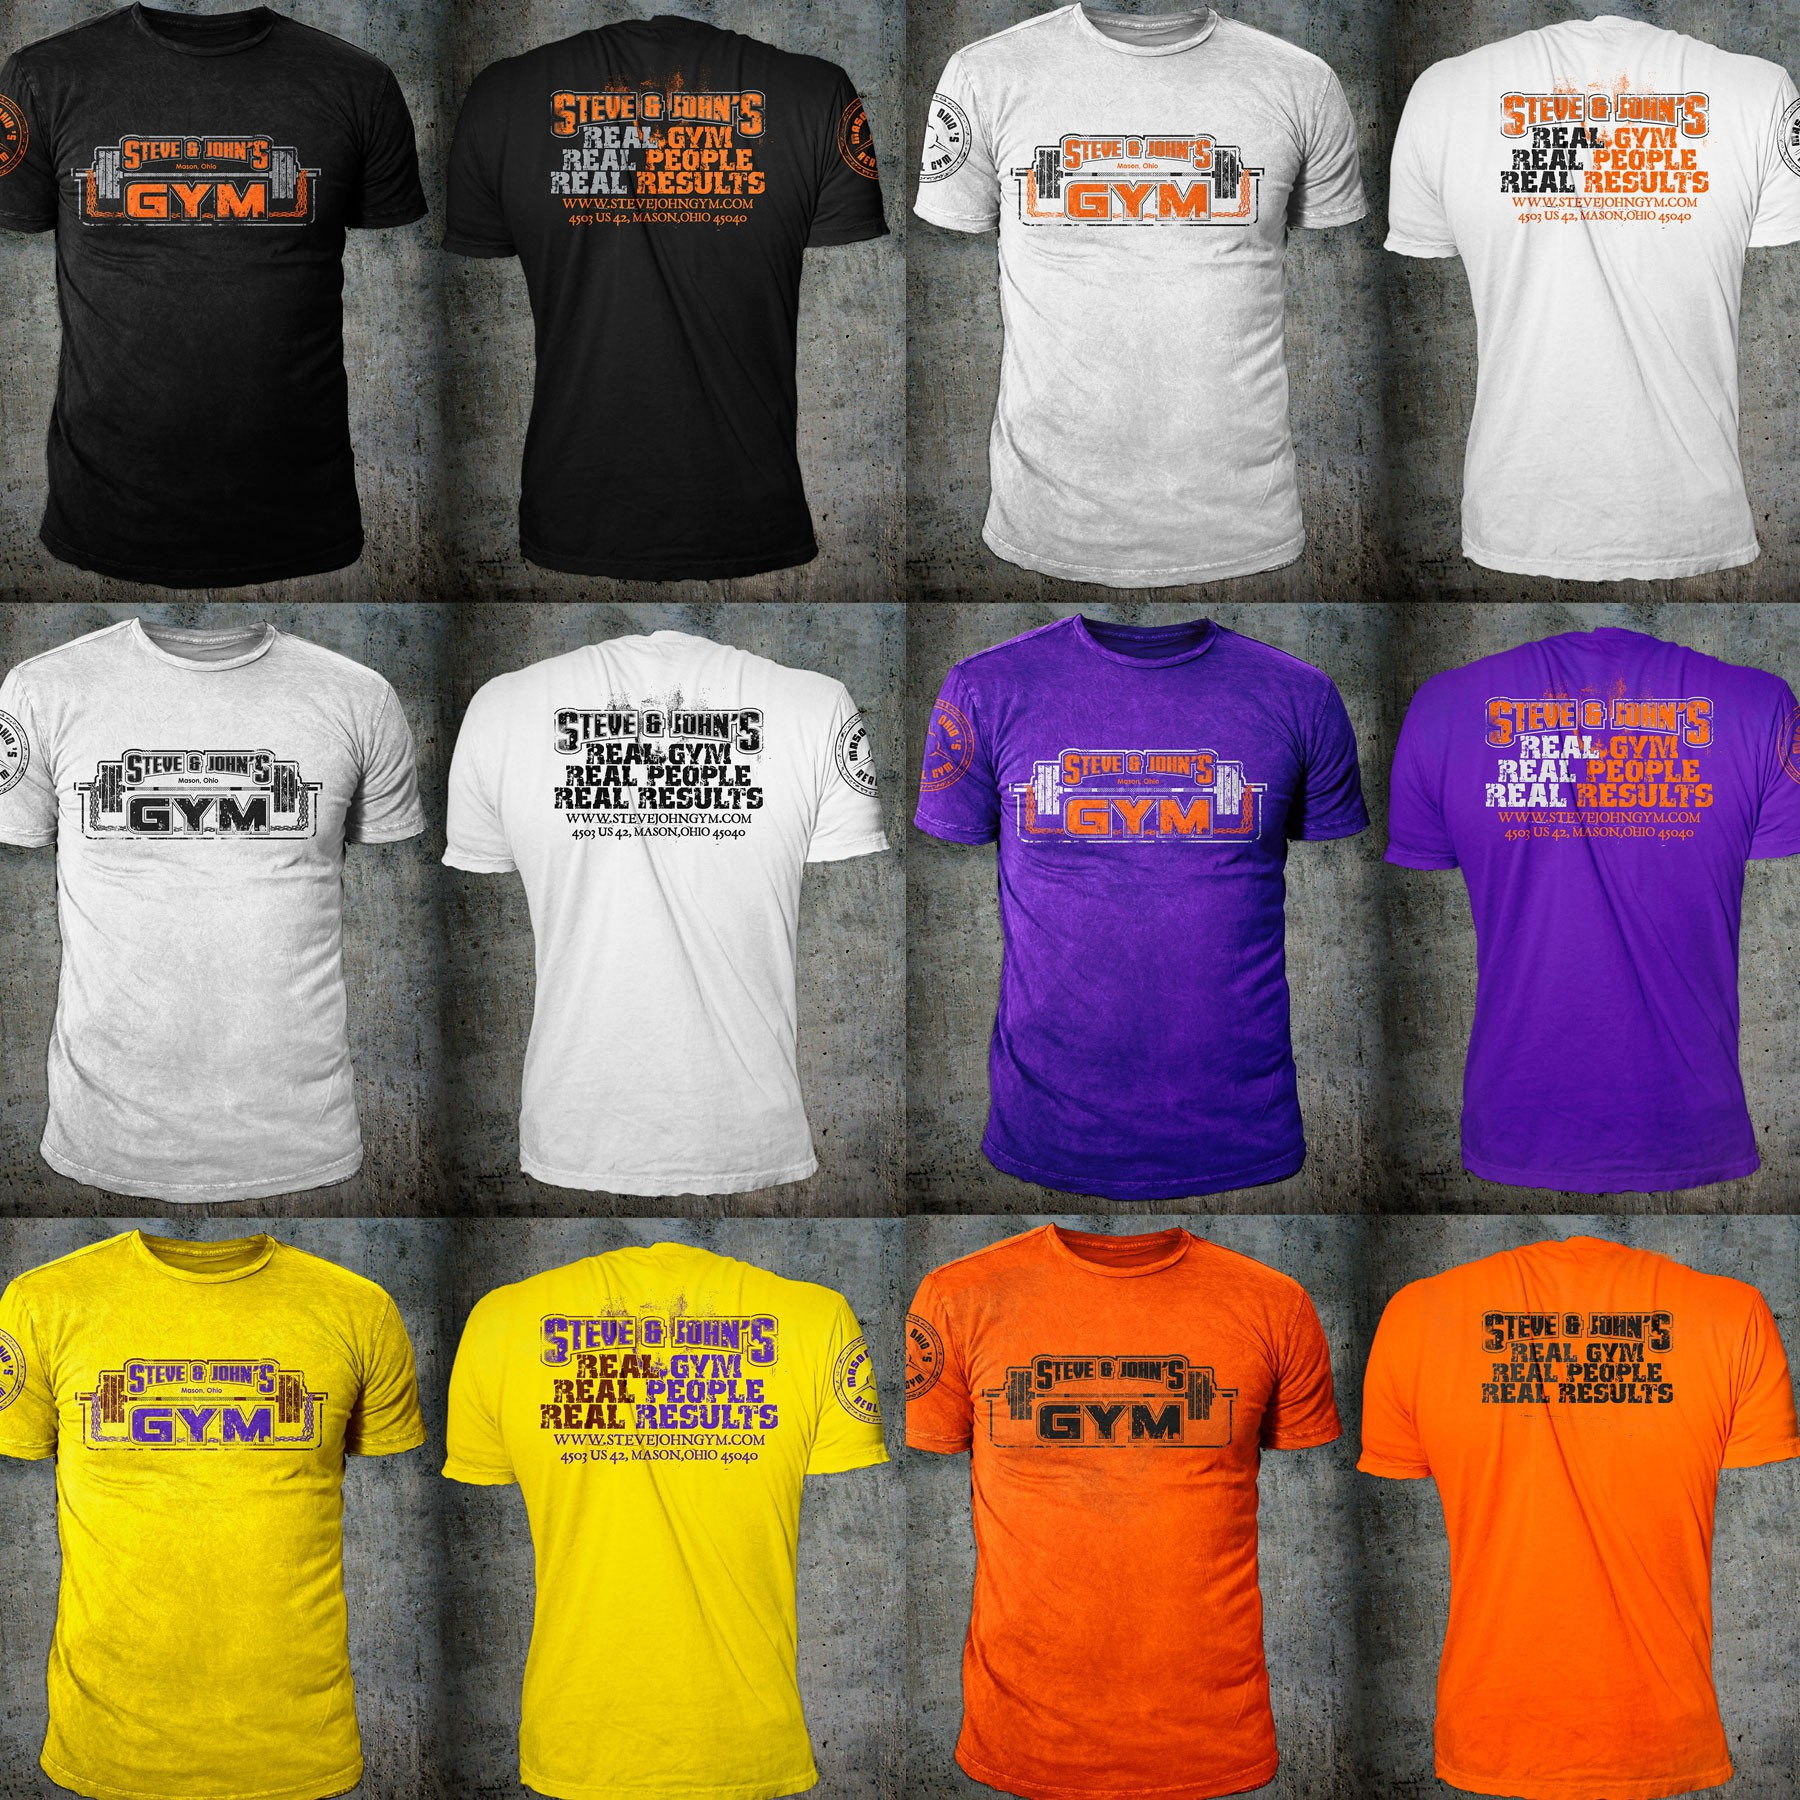 $Guaranteed$Hardcore Gym Shirts+MULTIPLE WINNERS+